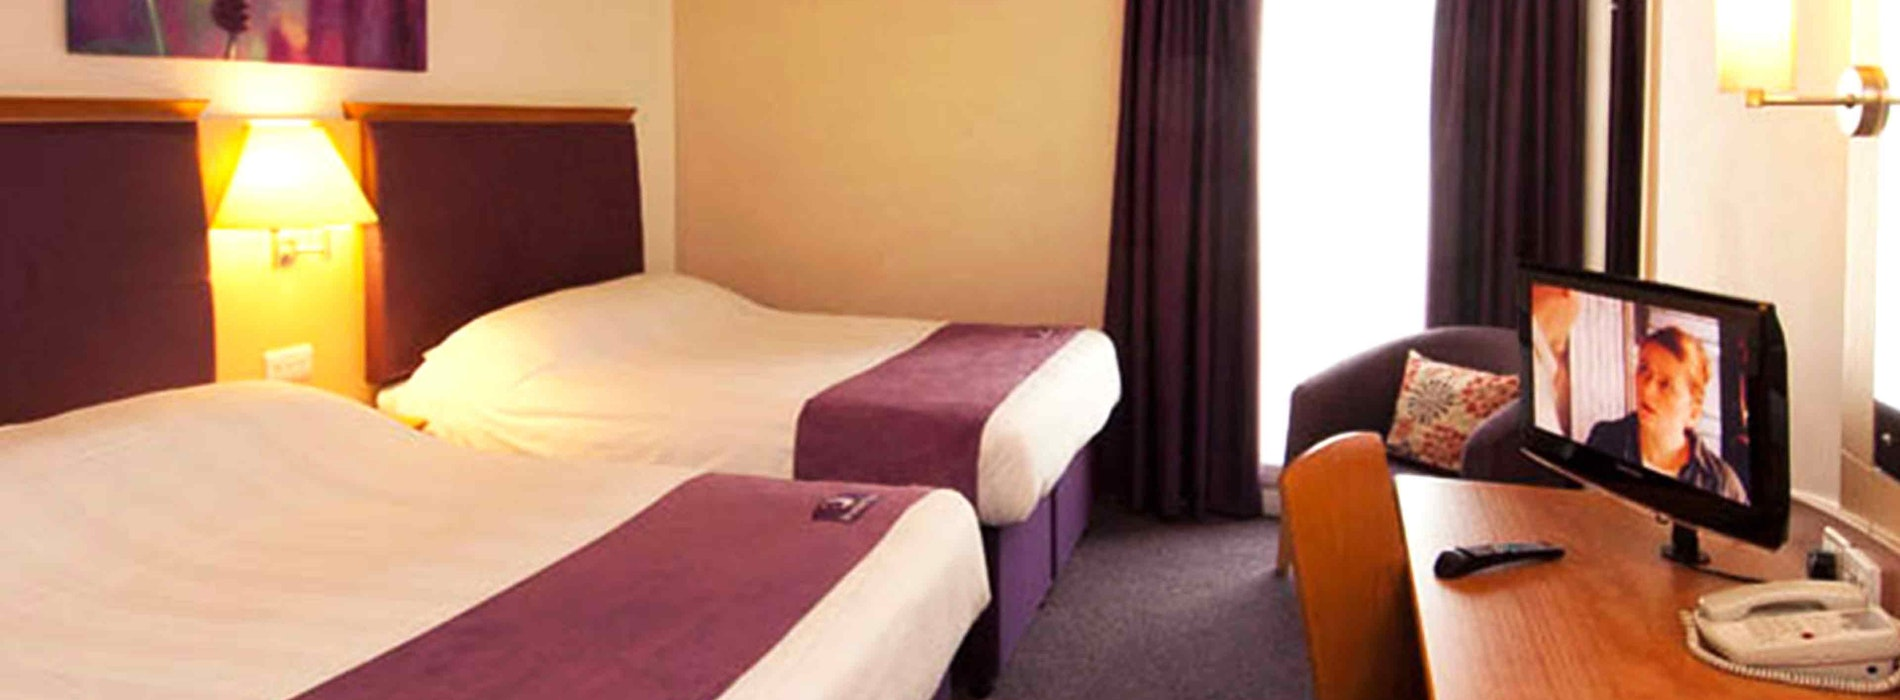 London Heathrow Premier Inn near LEGOLAND Windsor Resort